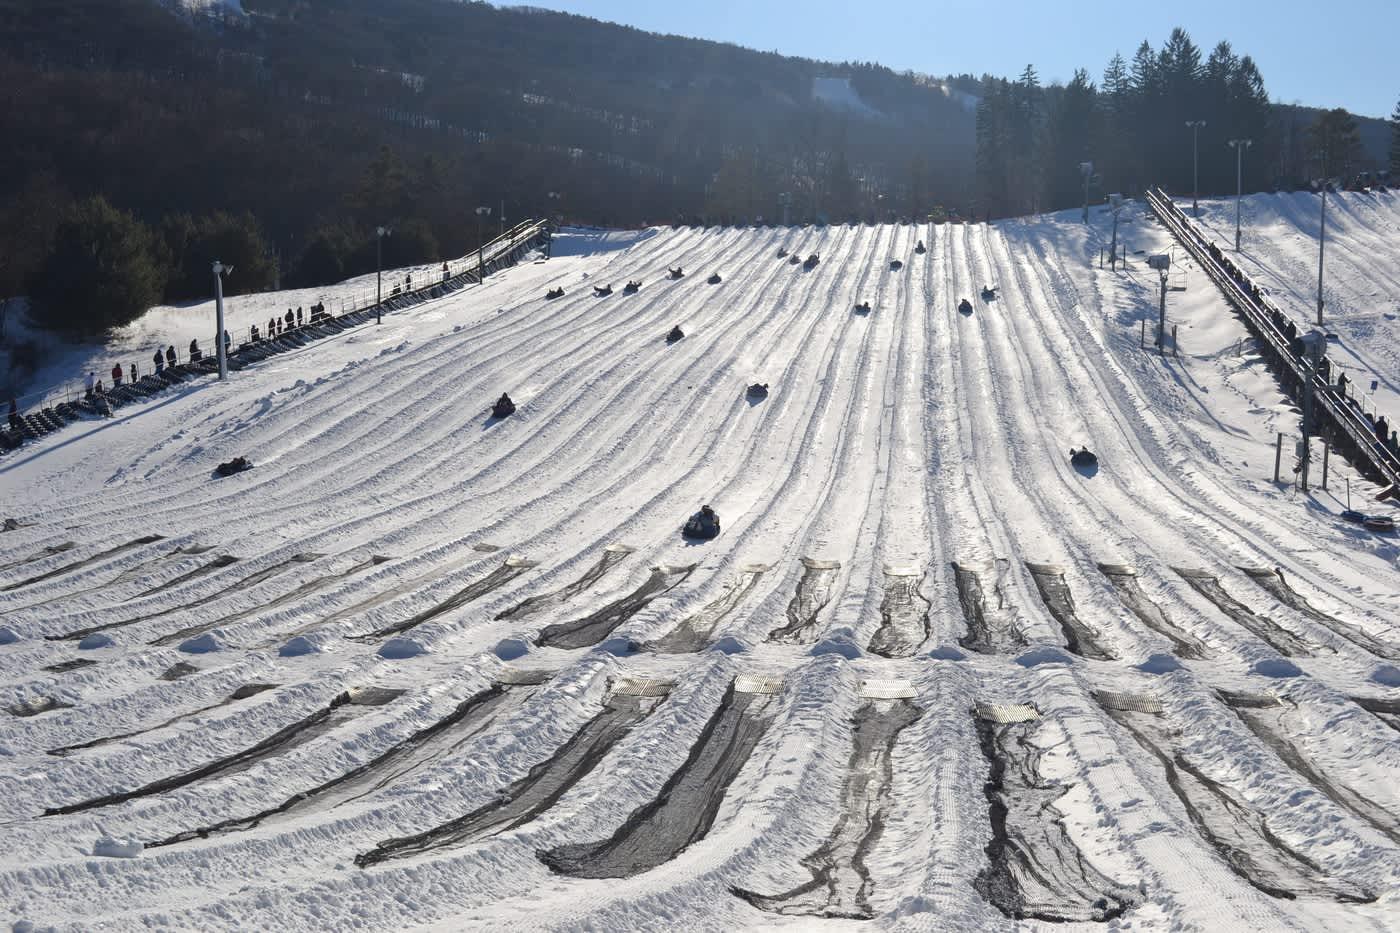 camelback mountain - snow tubing | tannersville, pa 18372